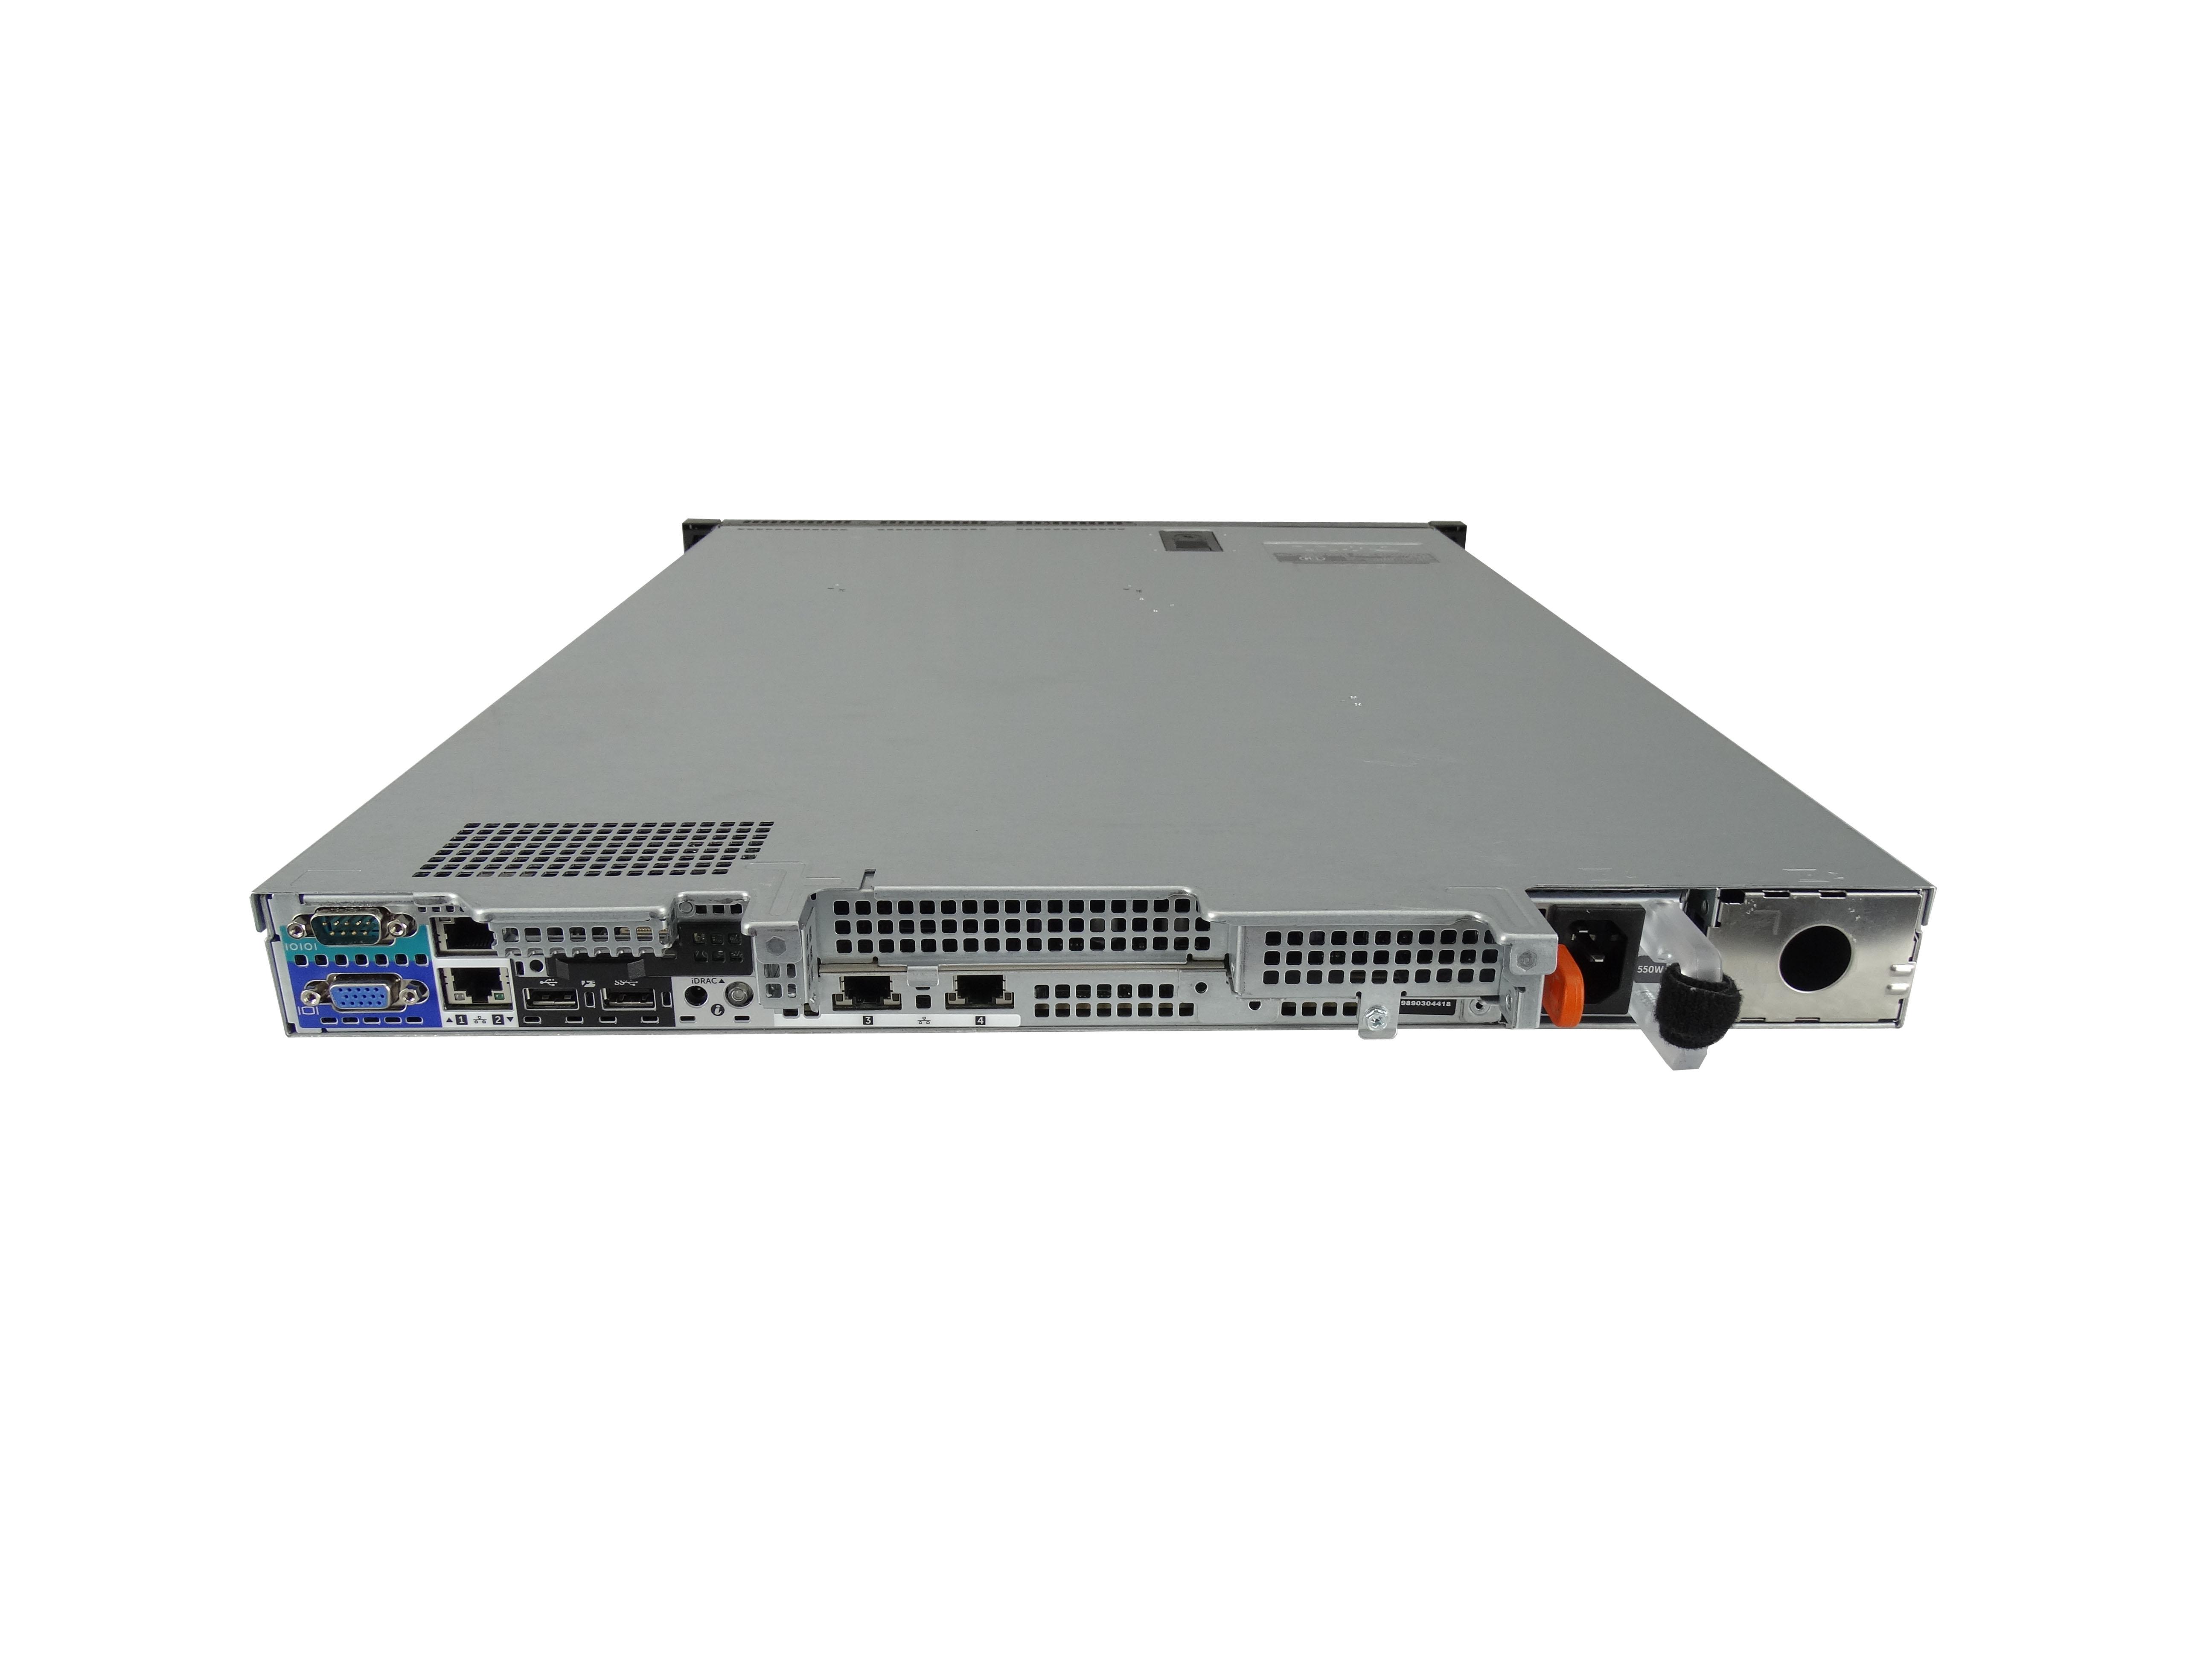 Dell PowerEdge R430 8-Bay SFF 1U Rackmount Server